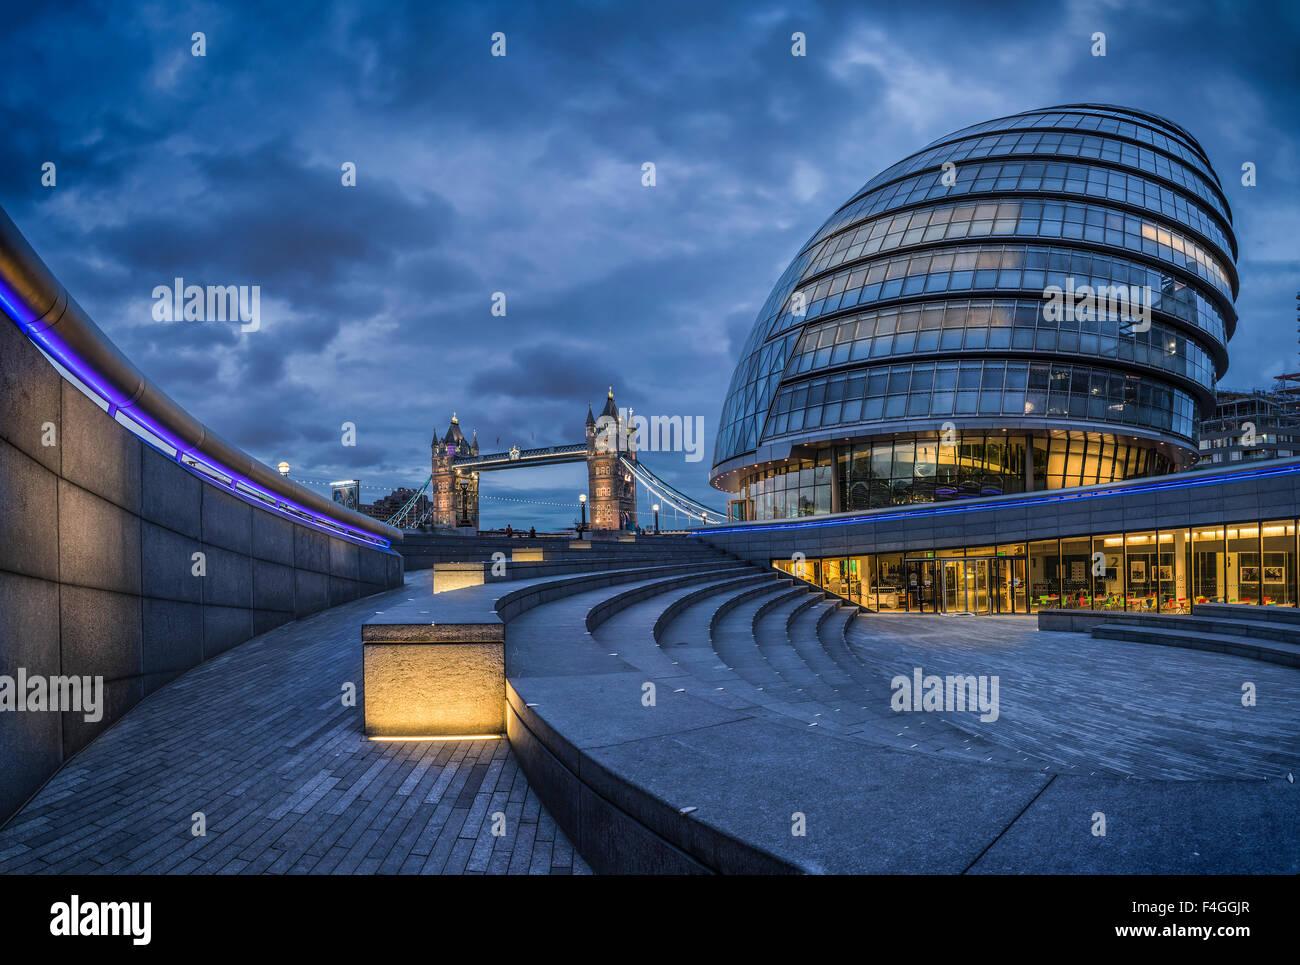 Sunrise, City Hall, Tower Bridge, London - Stock Image